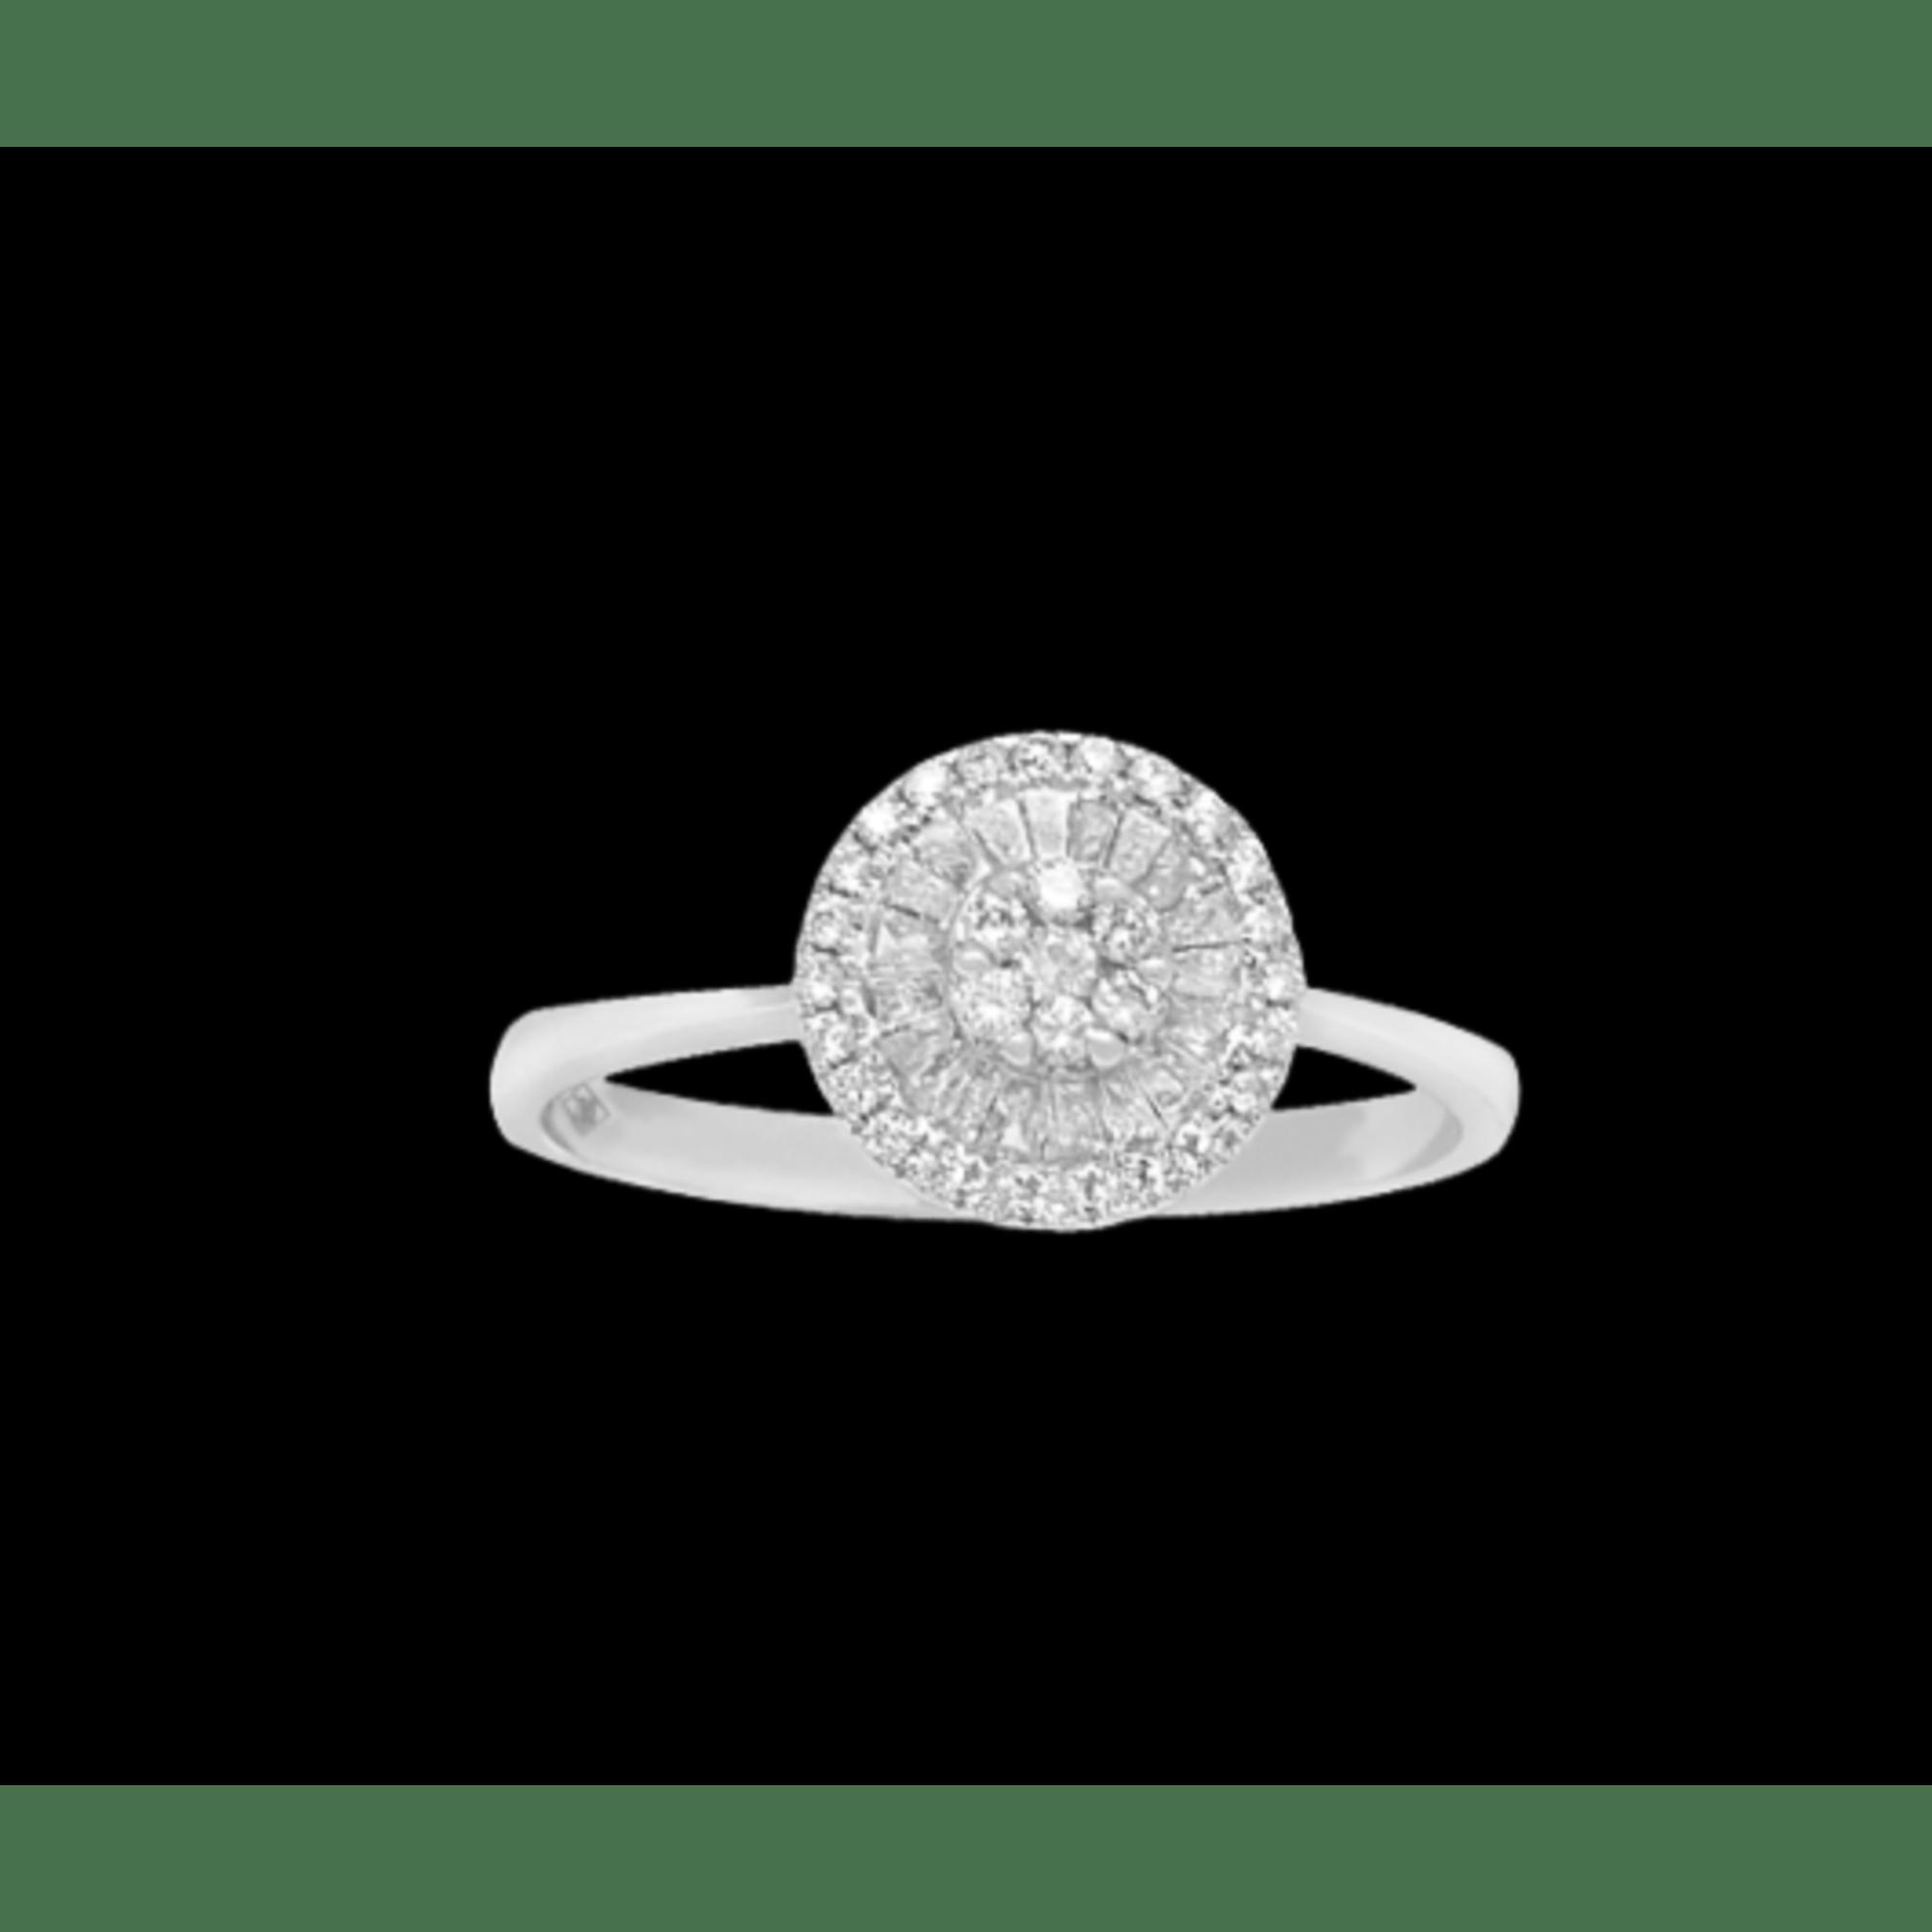 bague diamant djula